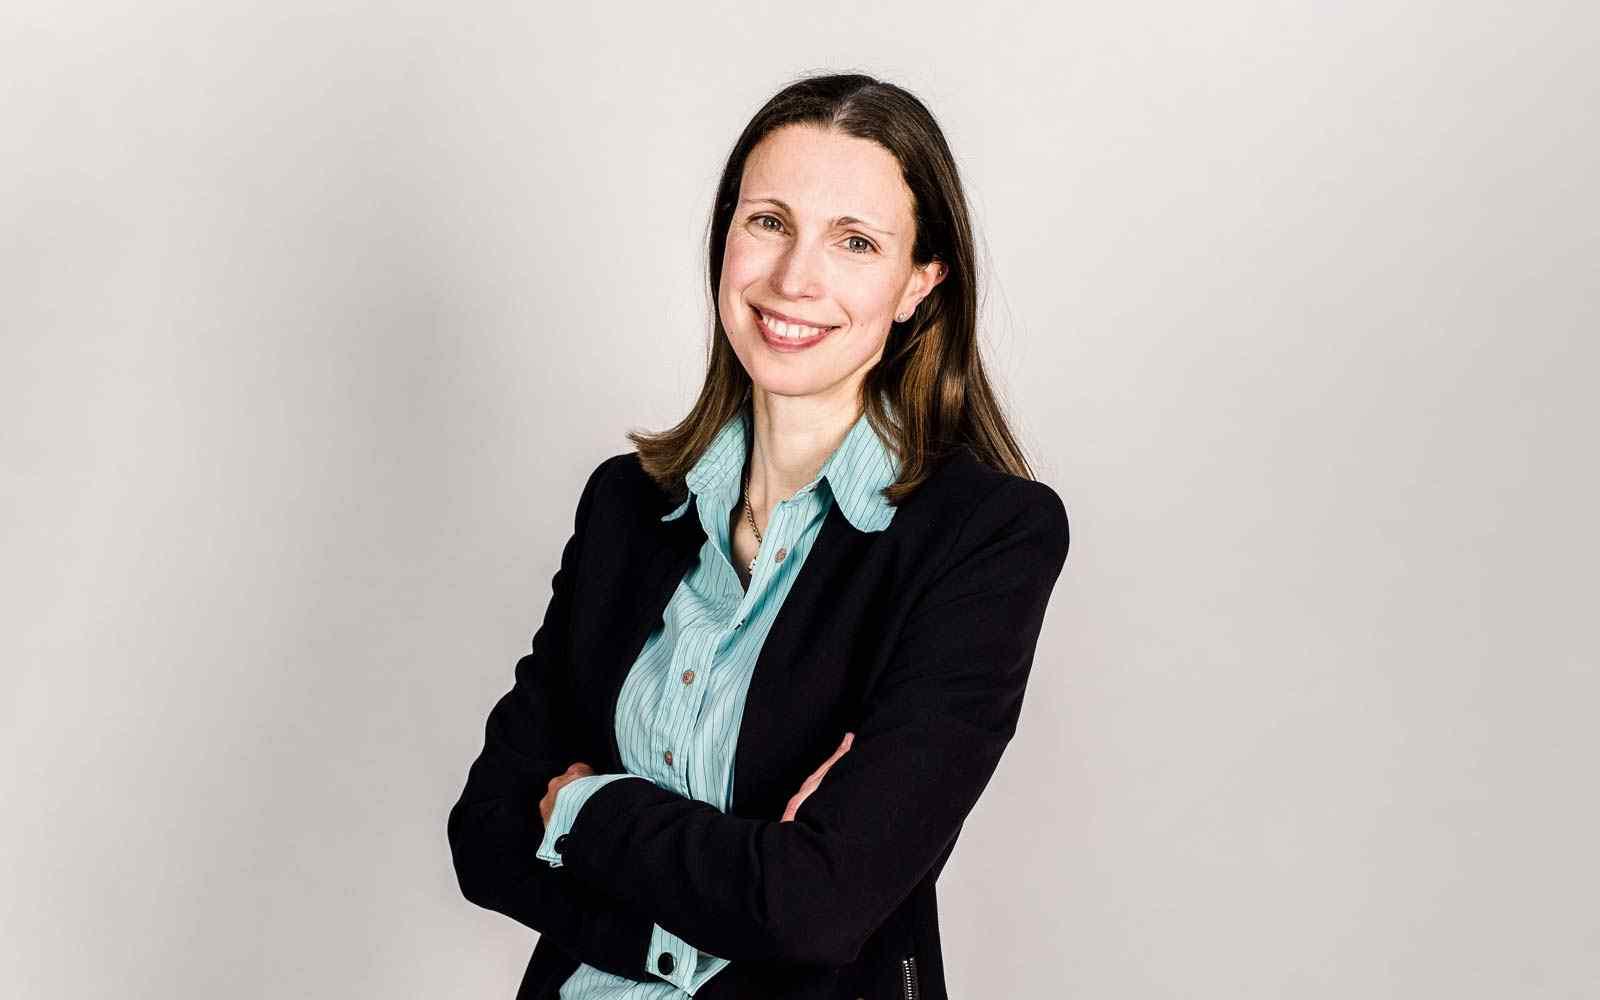 Susanna Dale-Simmonds